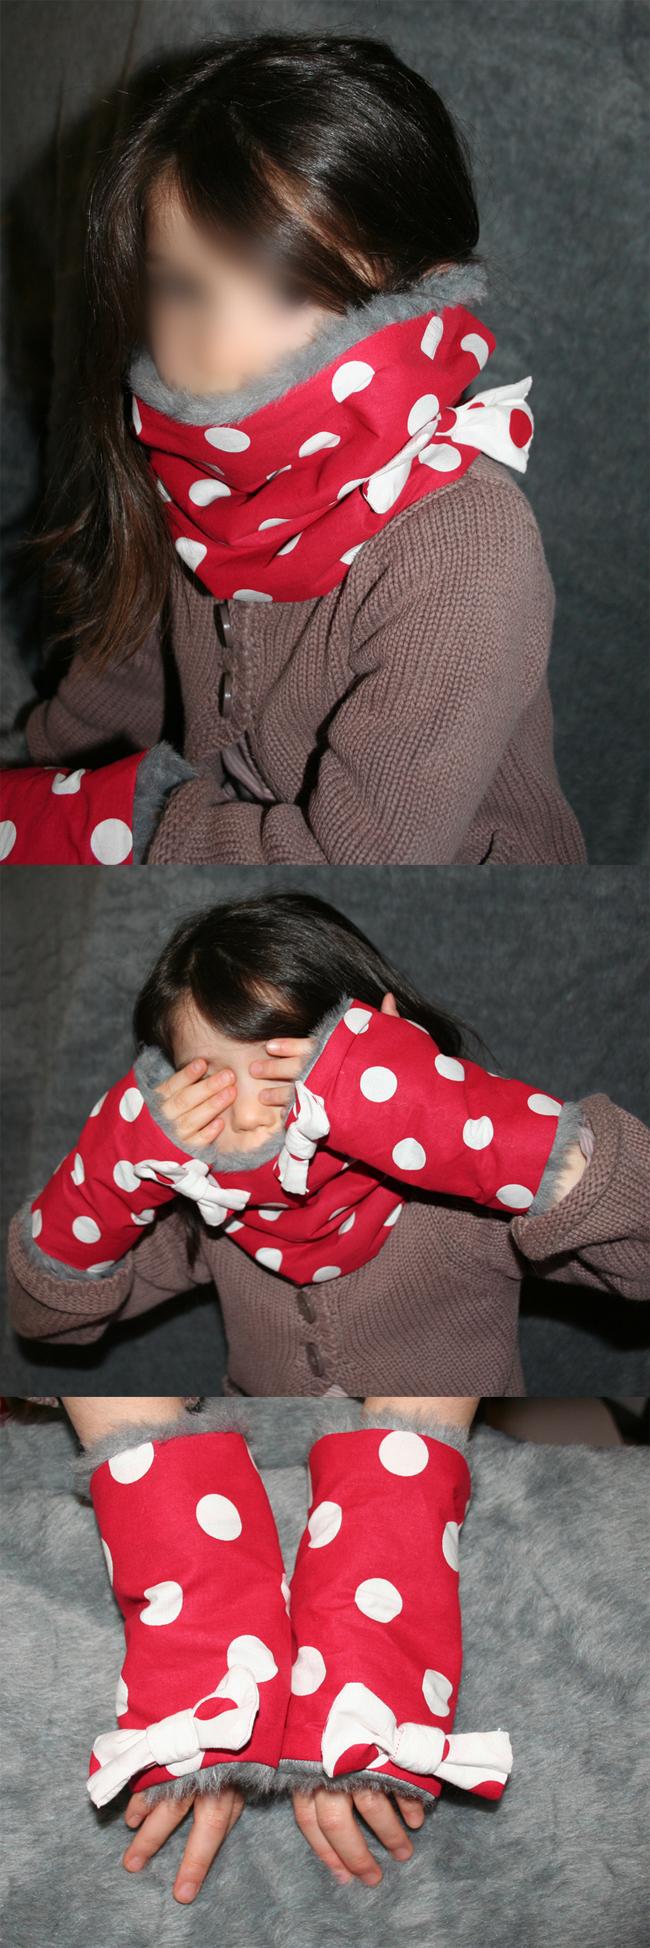 http://www.imaygine.com/wp-content/uploads/2011/12/colmitainestam.jpg